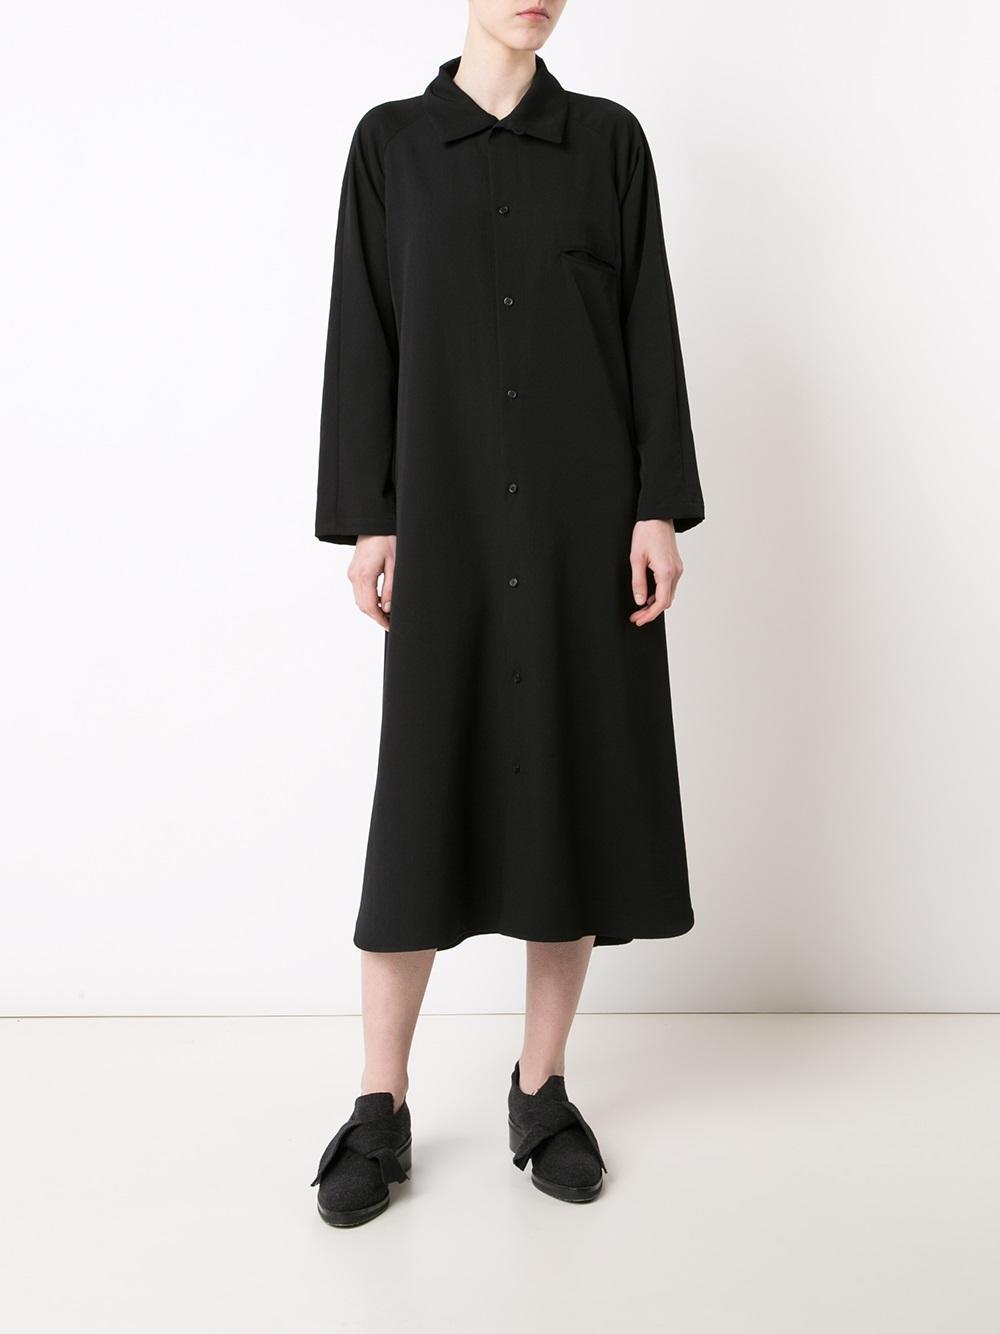 Lyst y 39 s yohji yamamoto midi shirt dress in black for Midi shirt dress black